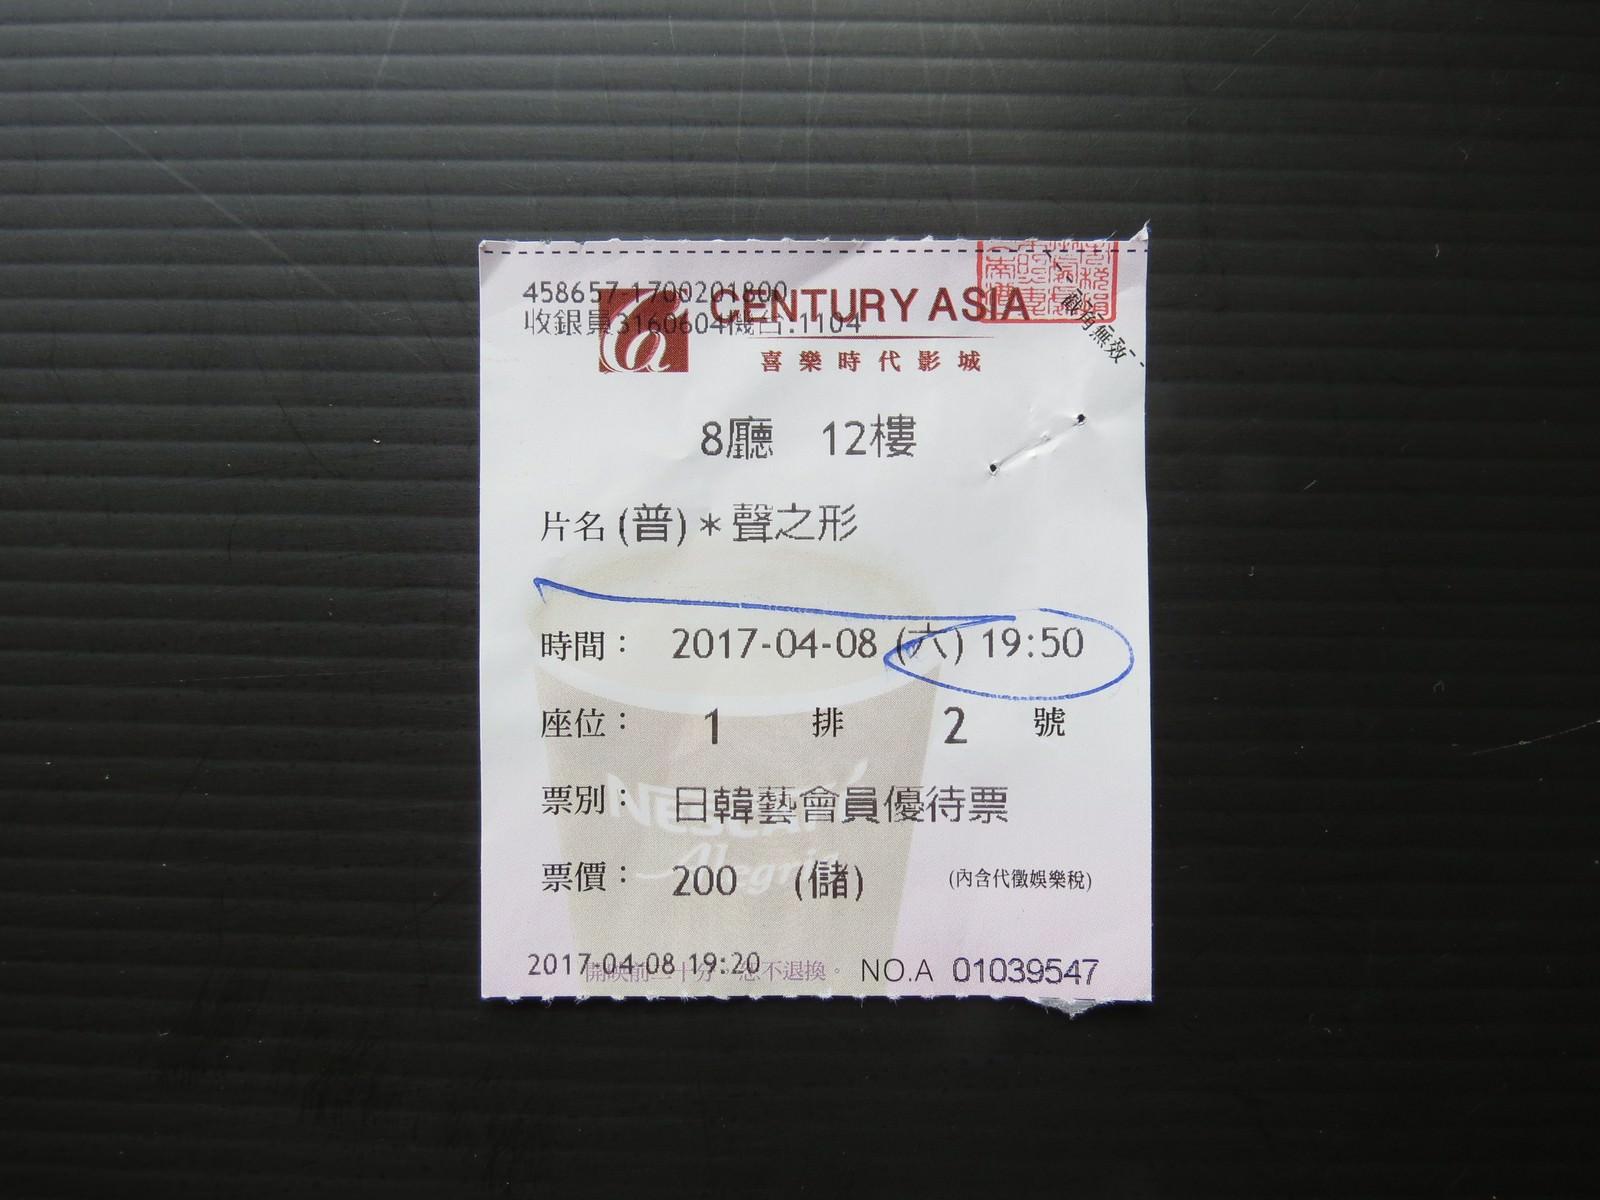 Movie, 映画『聲の形』(日本, 2016年) / 電影版聲之形(台灣) / A Silent Voice: the Movie(英文), 電影票(2刷)